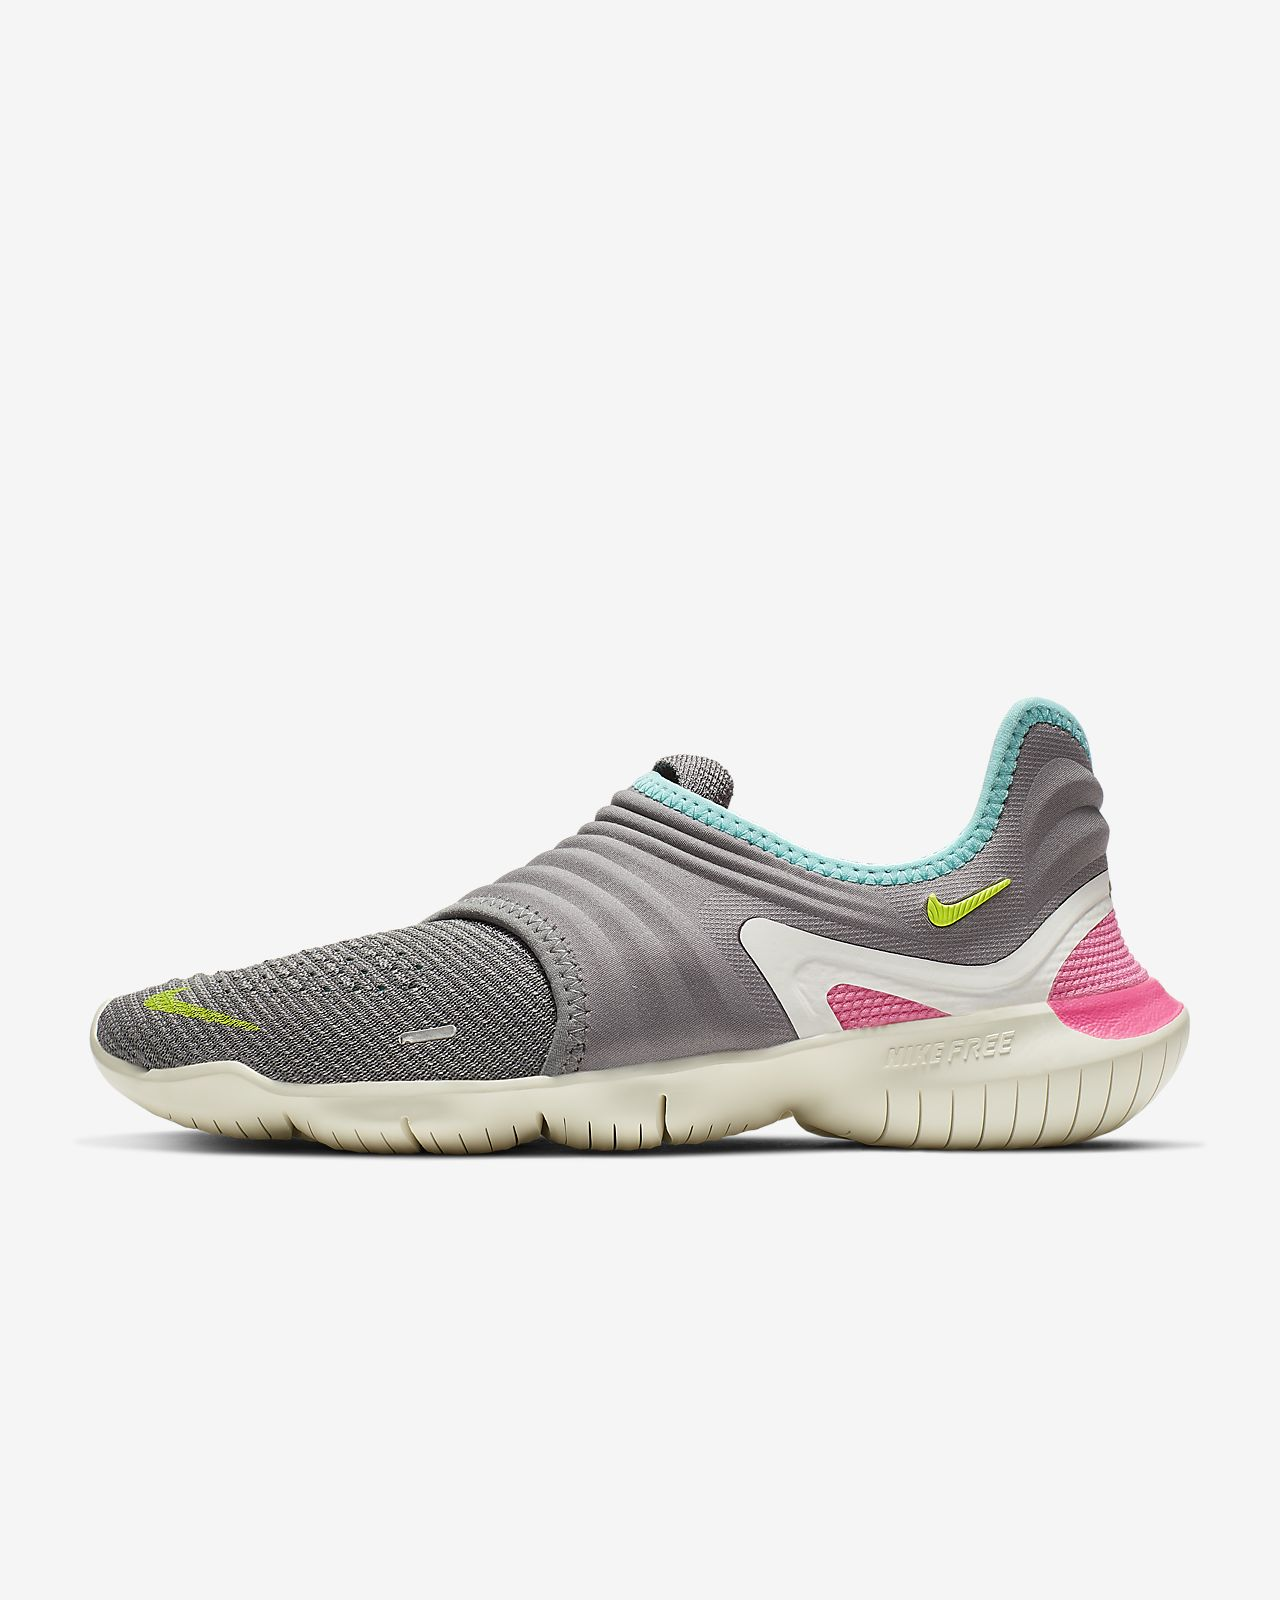 Женские беговые кроссовки Nike Free RN Flyknit 3,0